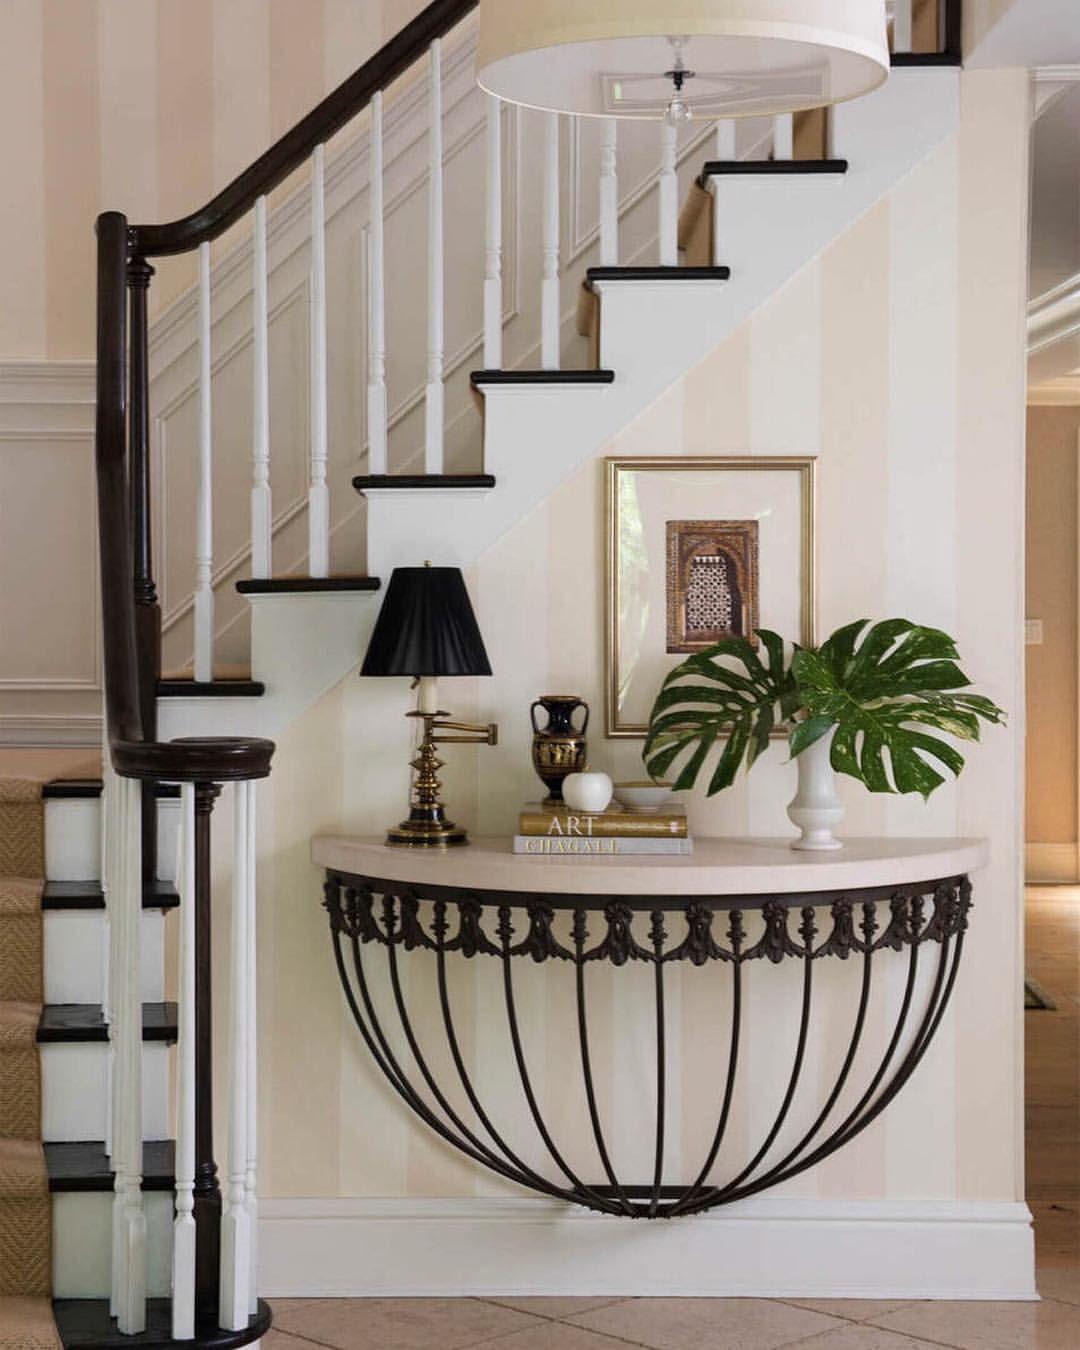 Stunning deco inspired entry featurex ideas para el hogar en